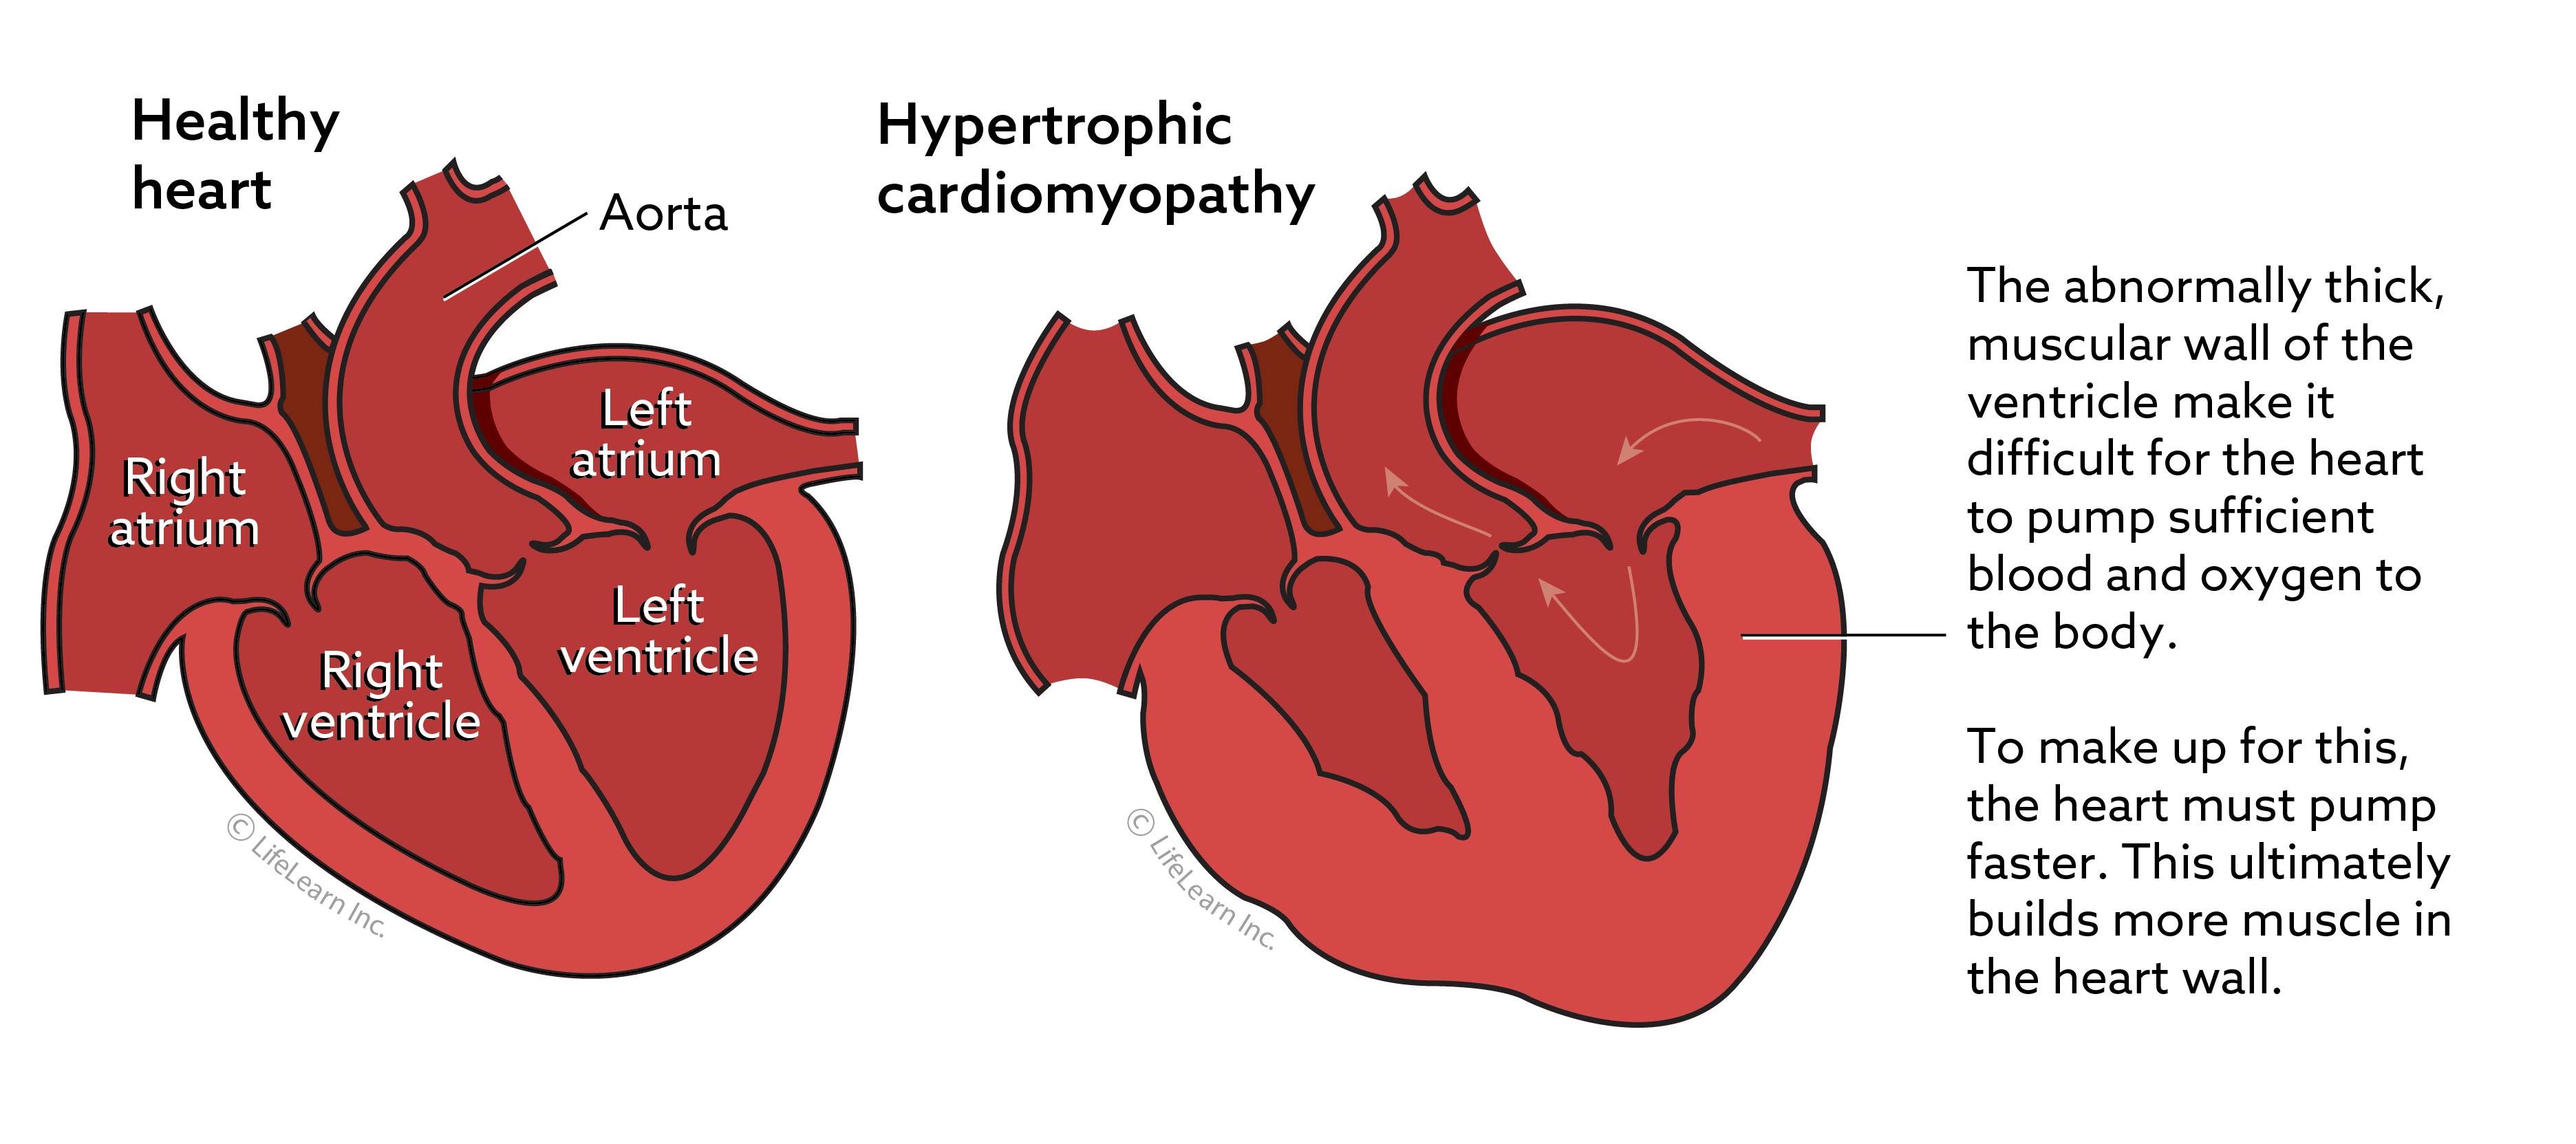 heart_disease_healthyheart_hypertrophic_cardiomyopathy